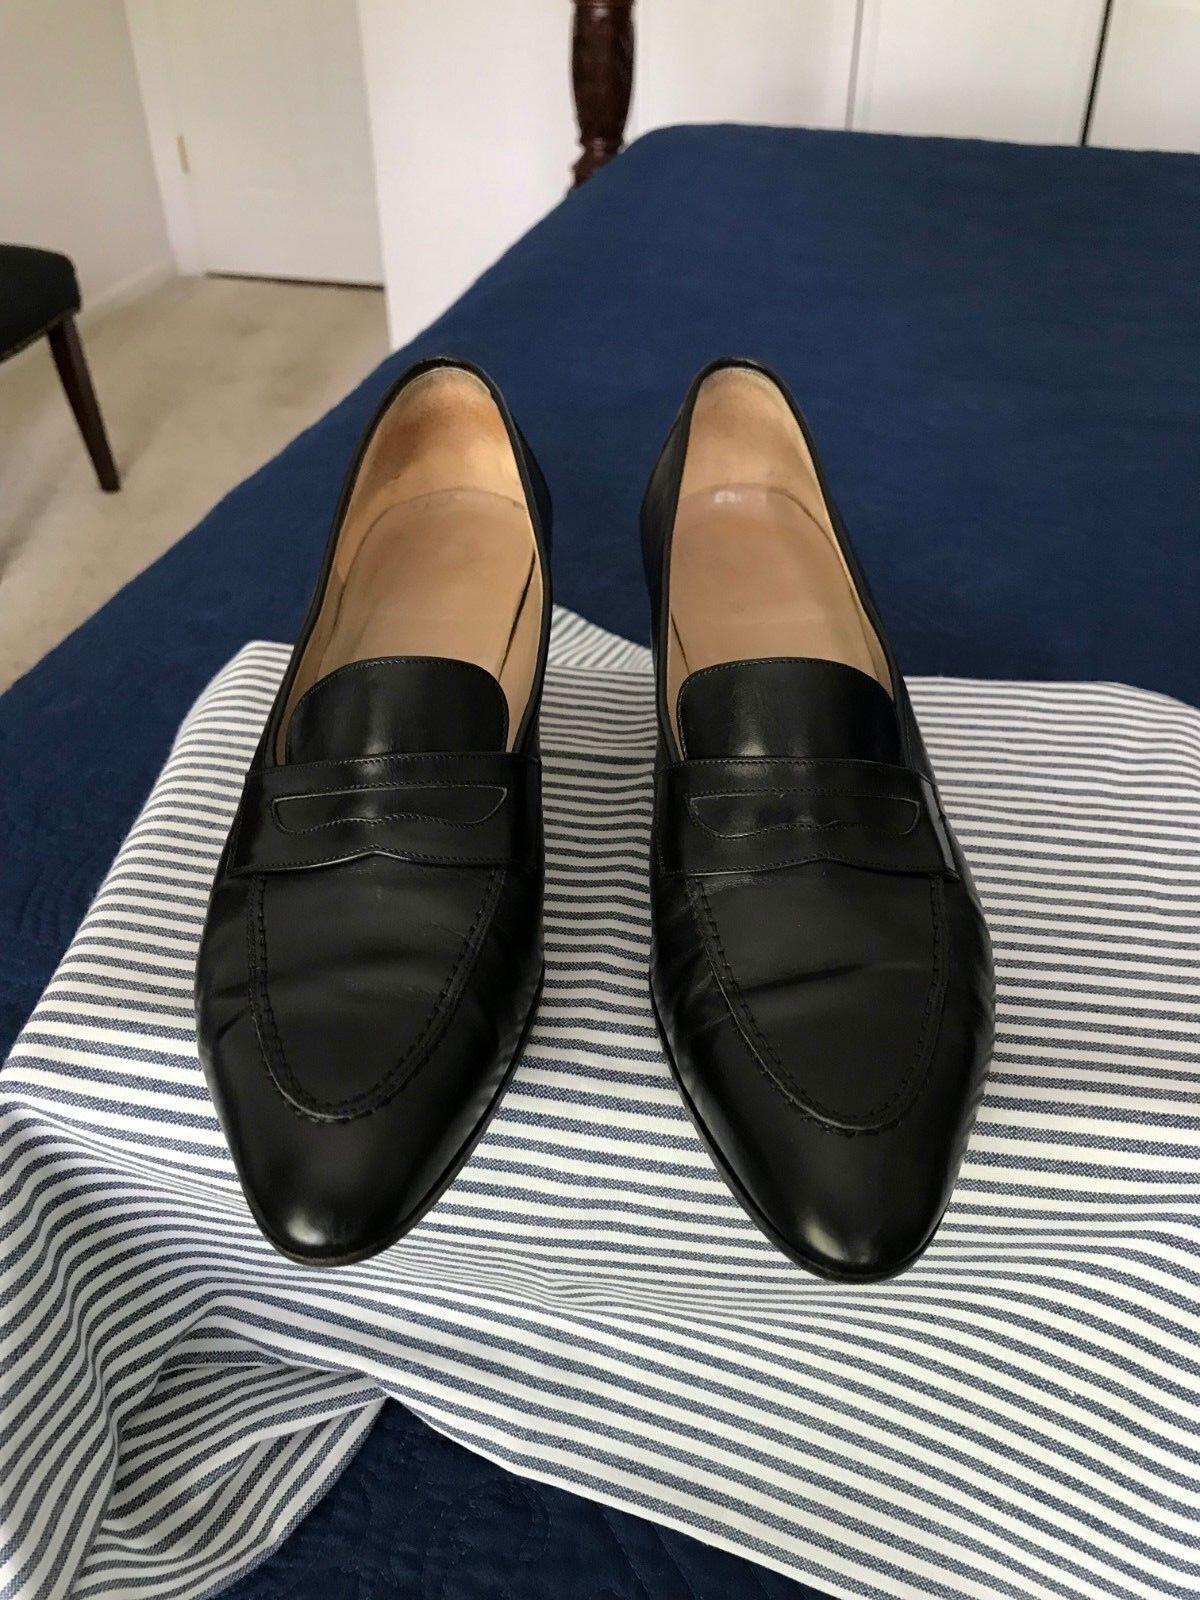 Ferragamo Women's Women's Ferragamo Shoes Heels, 7B, Black, (FF026), Retail $545.00 38af94